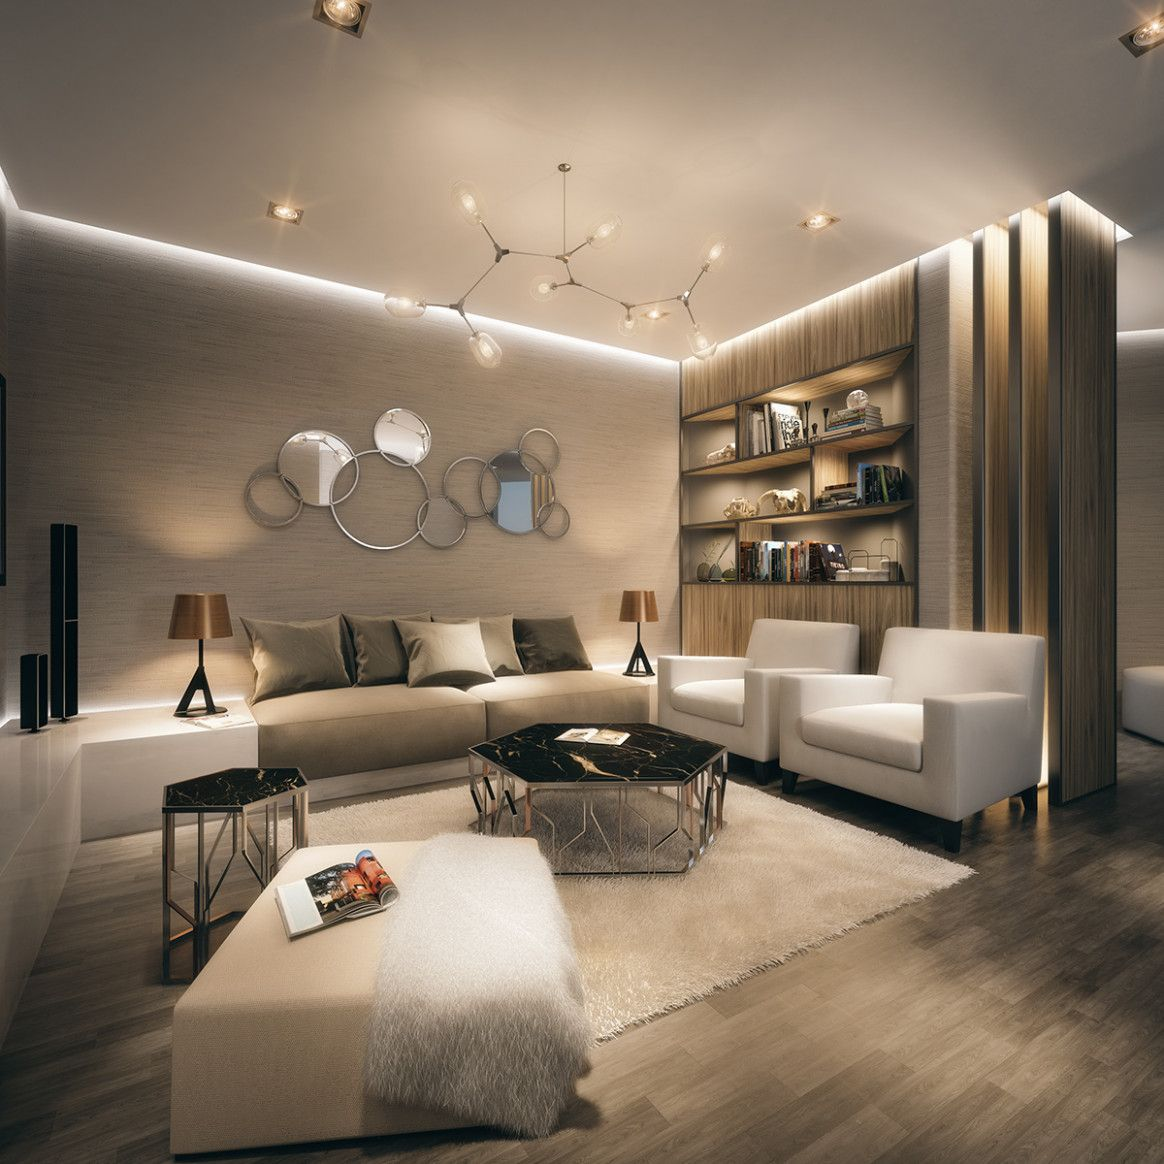 Fancy Apartment Decor Ideas Luxury Apartment Decor Luxury Apartment Interior Design Apartment Interior